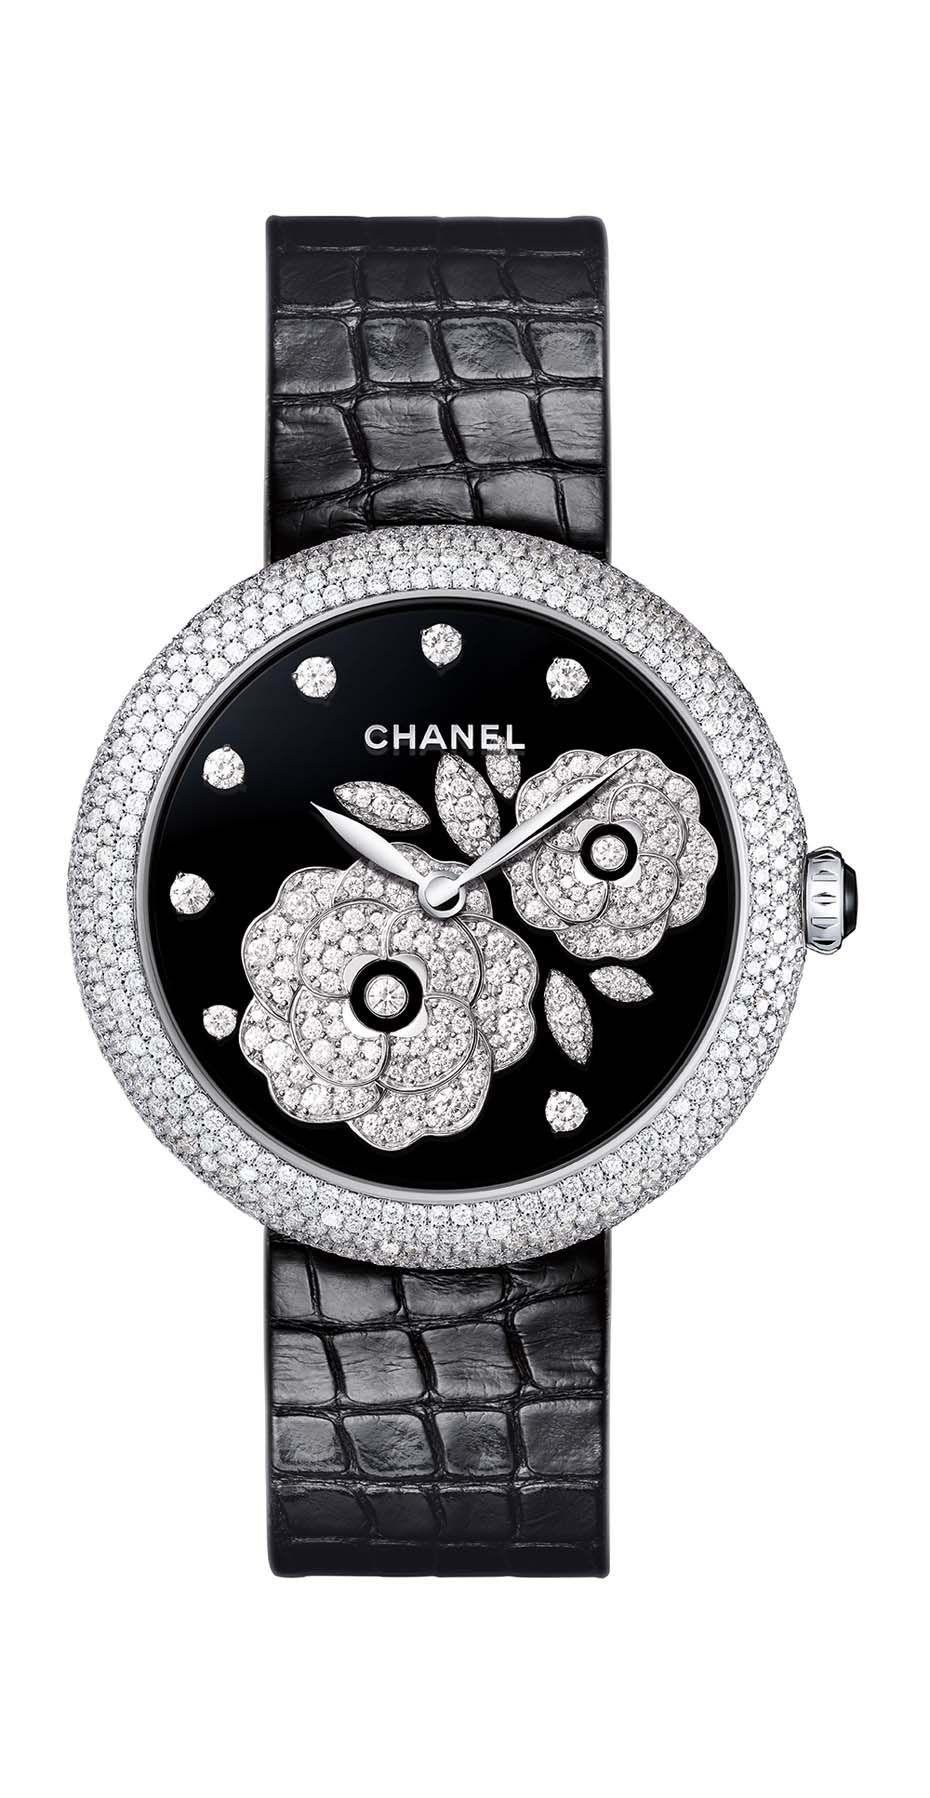 Look - Mademoiselle chanel prive watch craftsmanship video